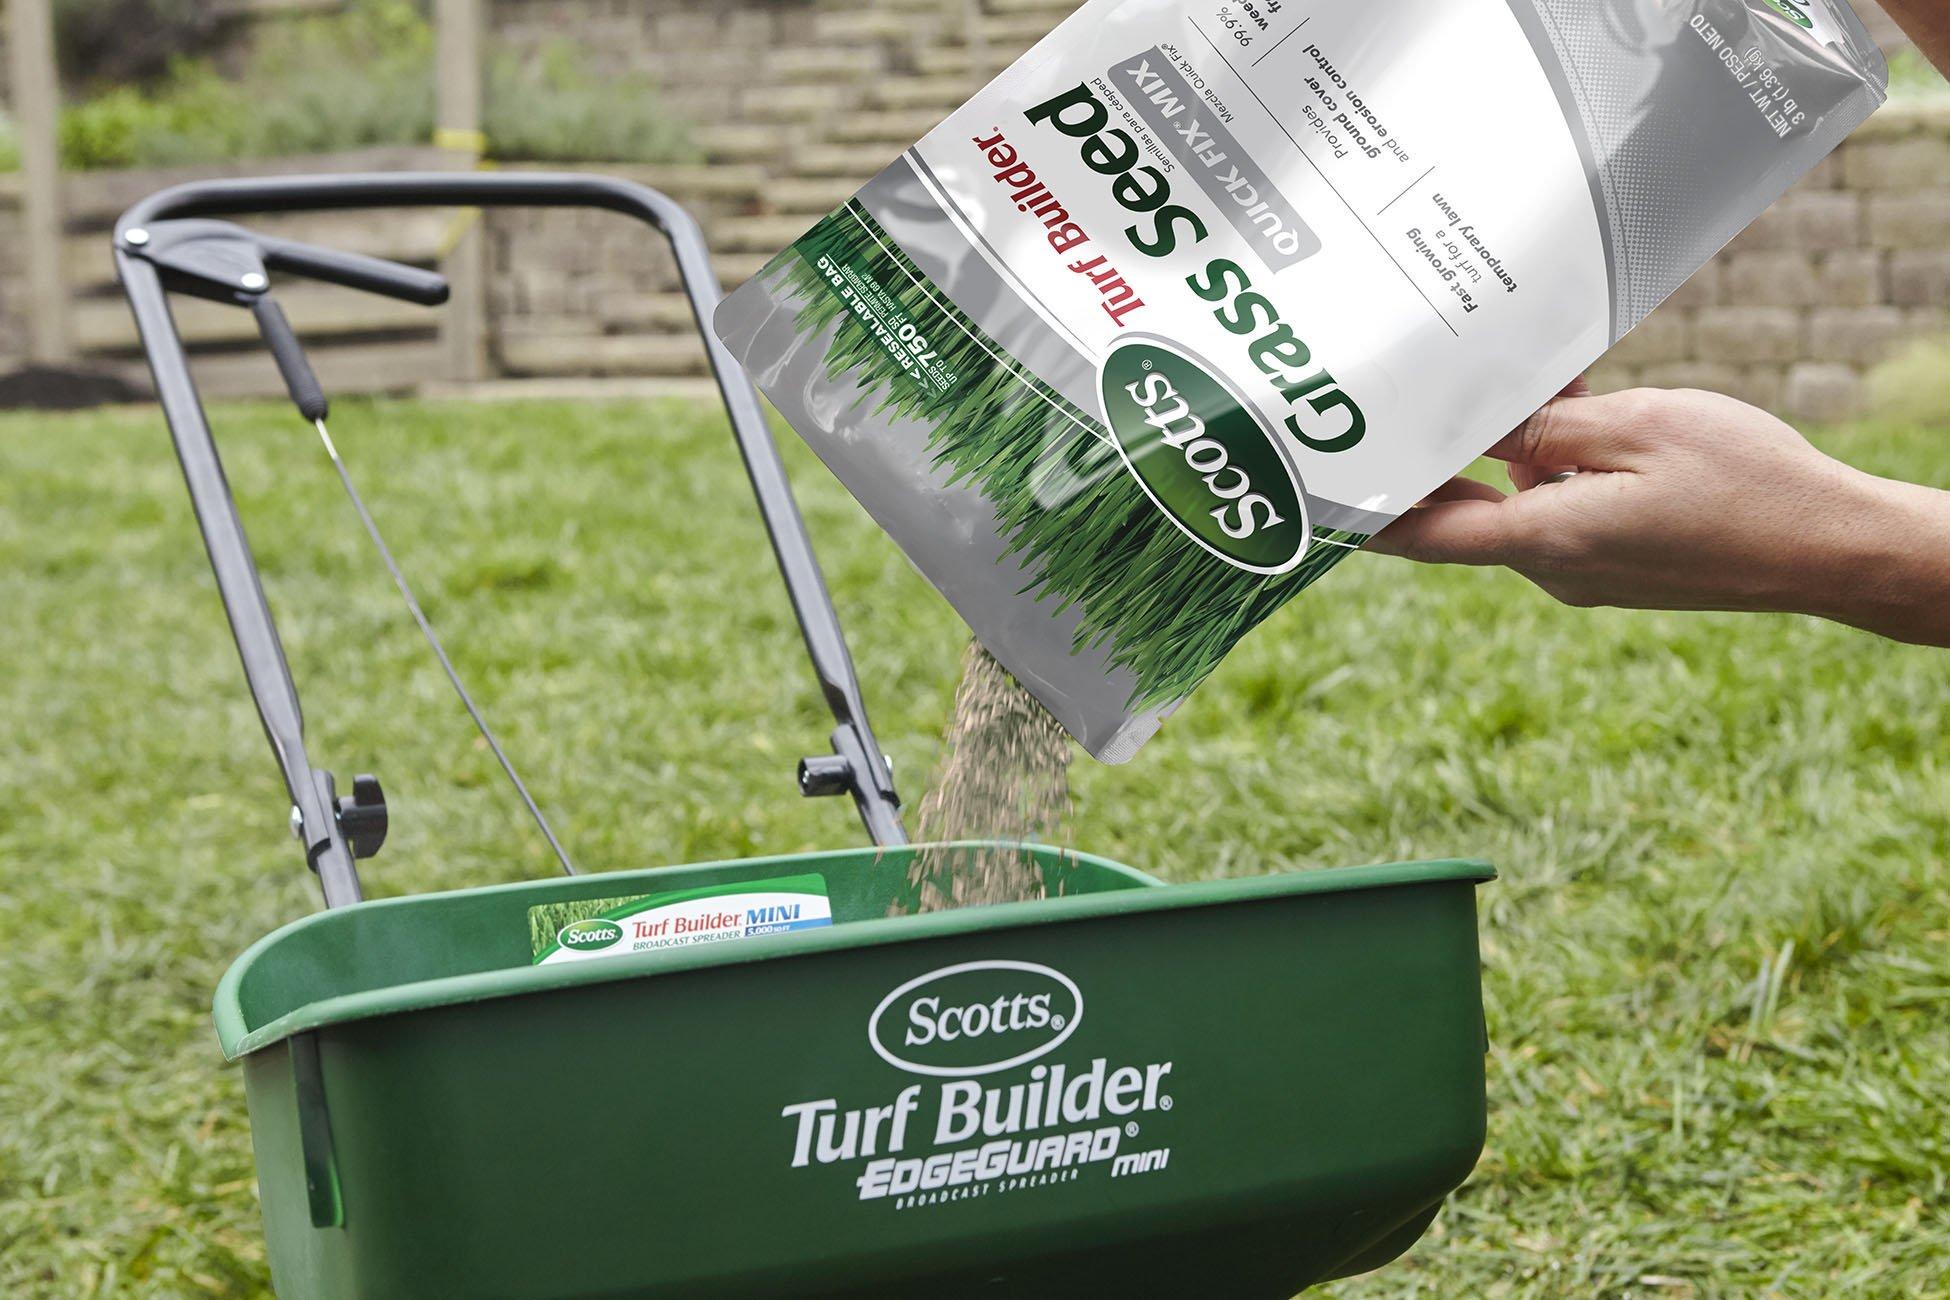 Scotts Turf Builder Quick Fix Mix, 3 Pounds by Scotts